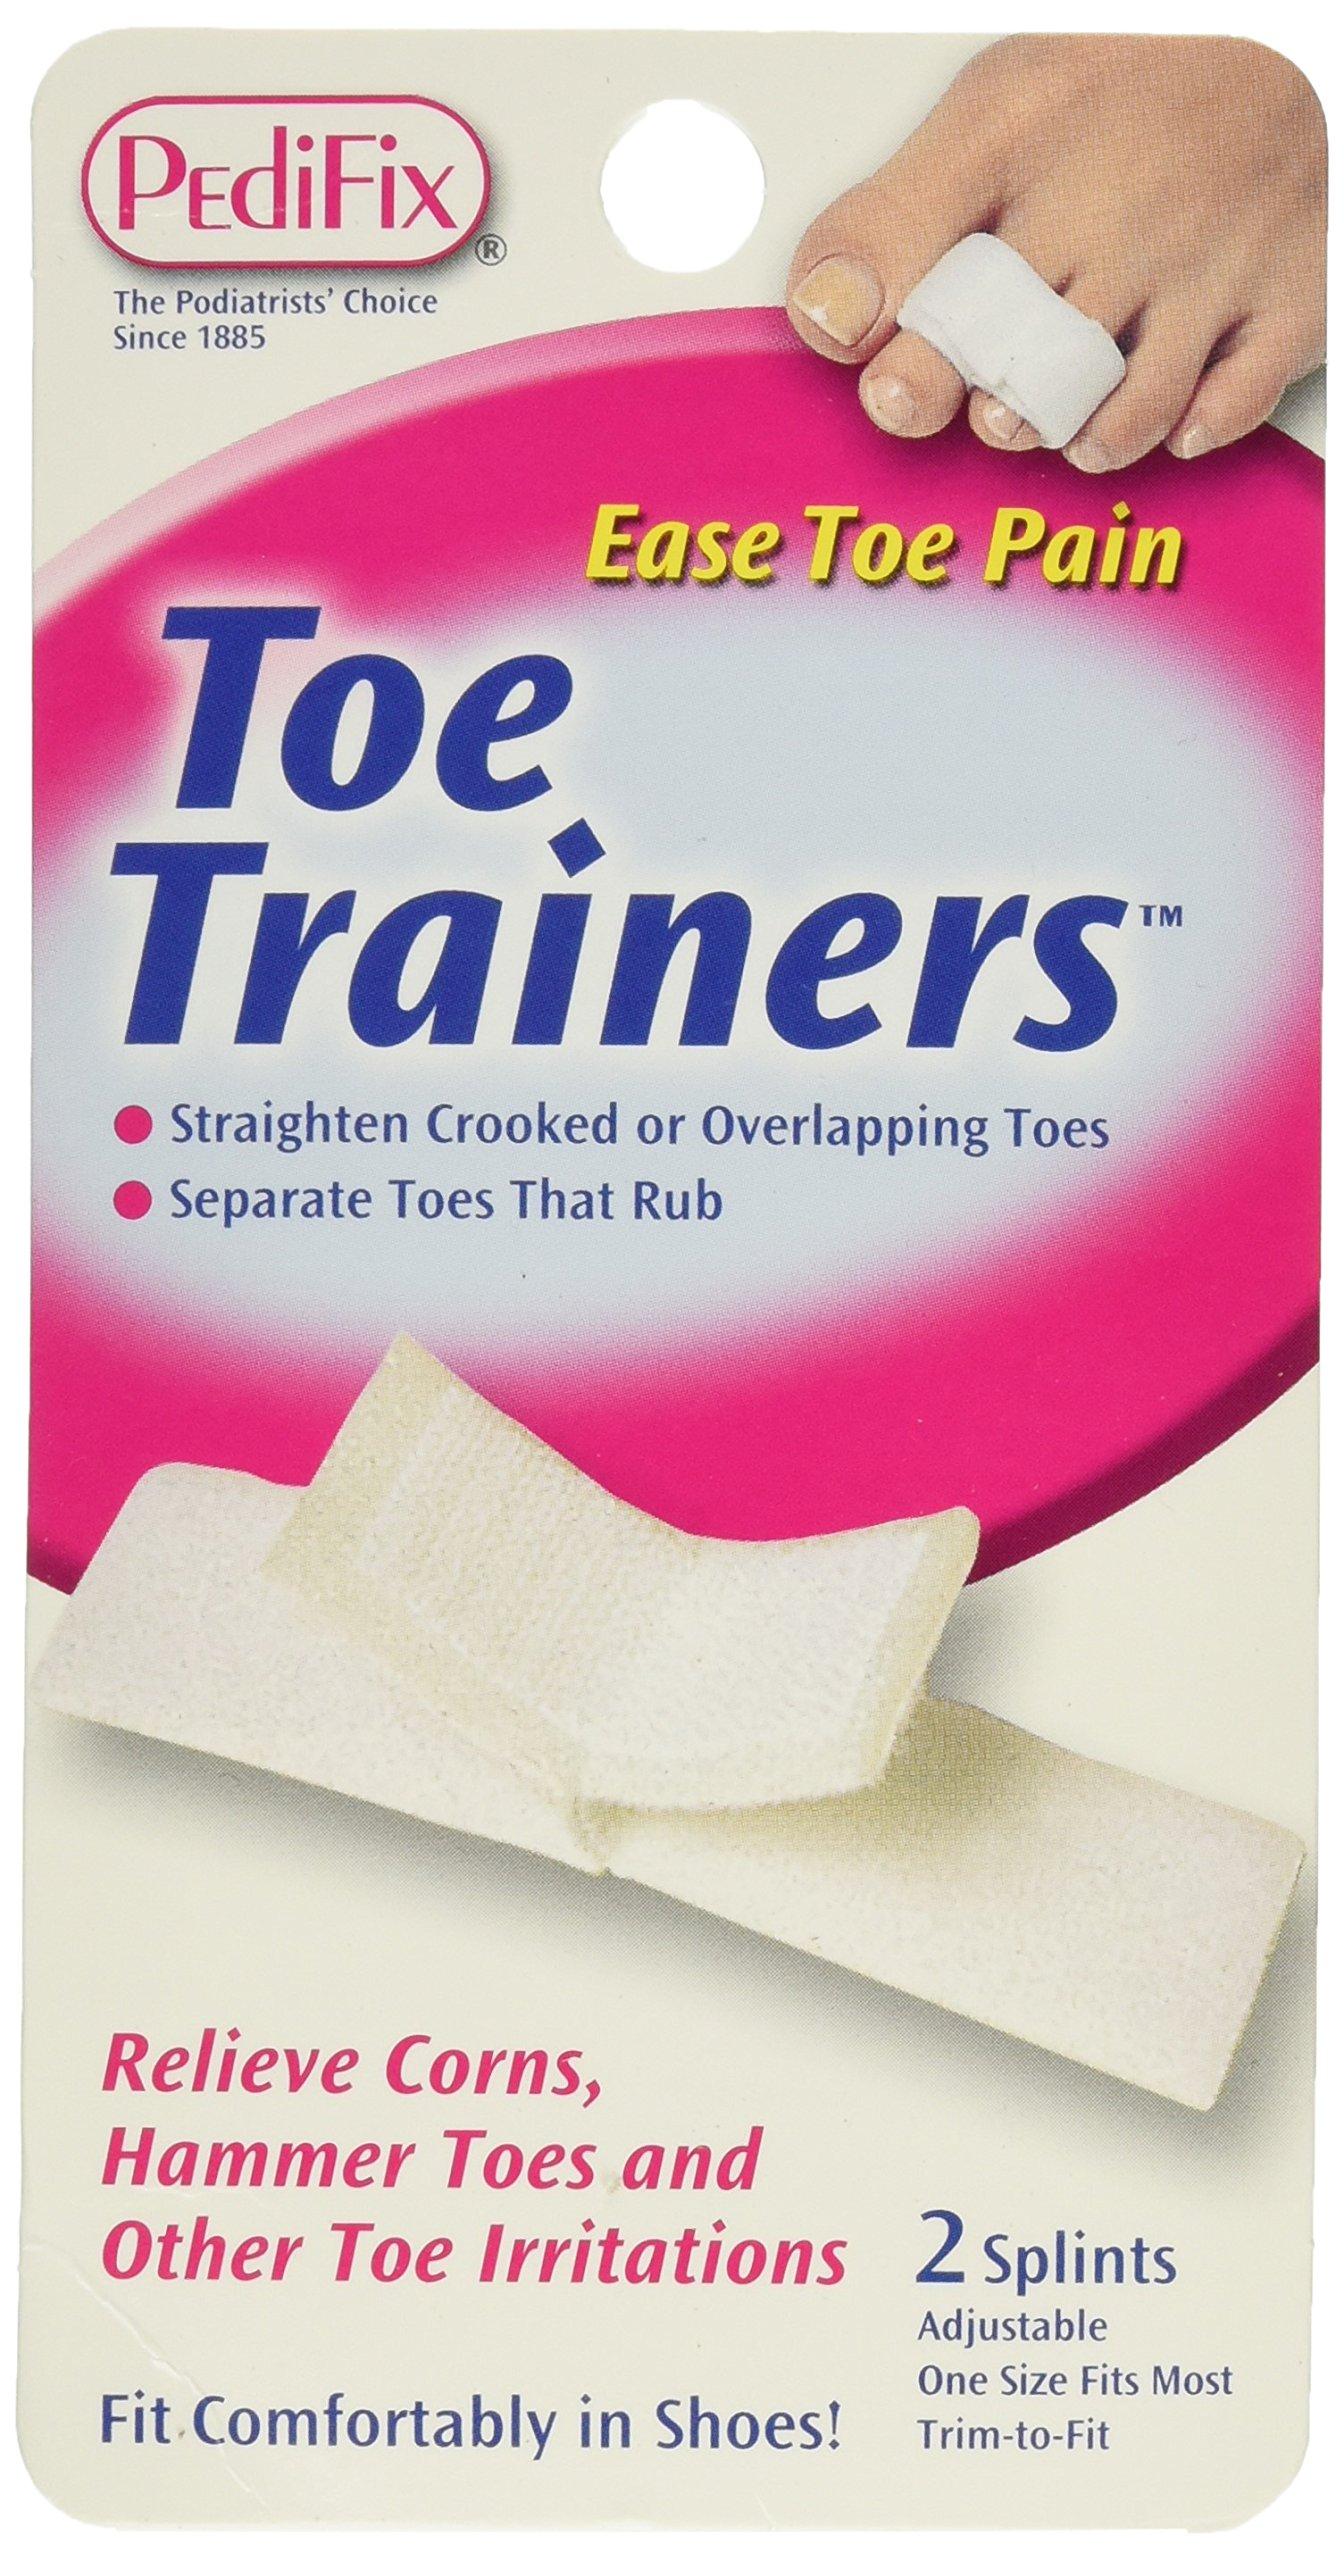 PediFix Ease Toe Pain, Toe Trainers